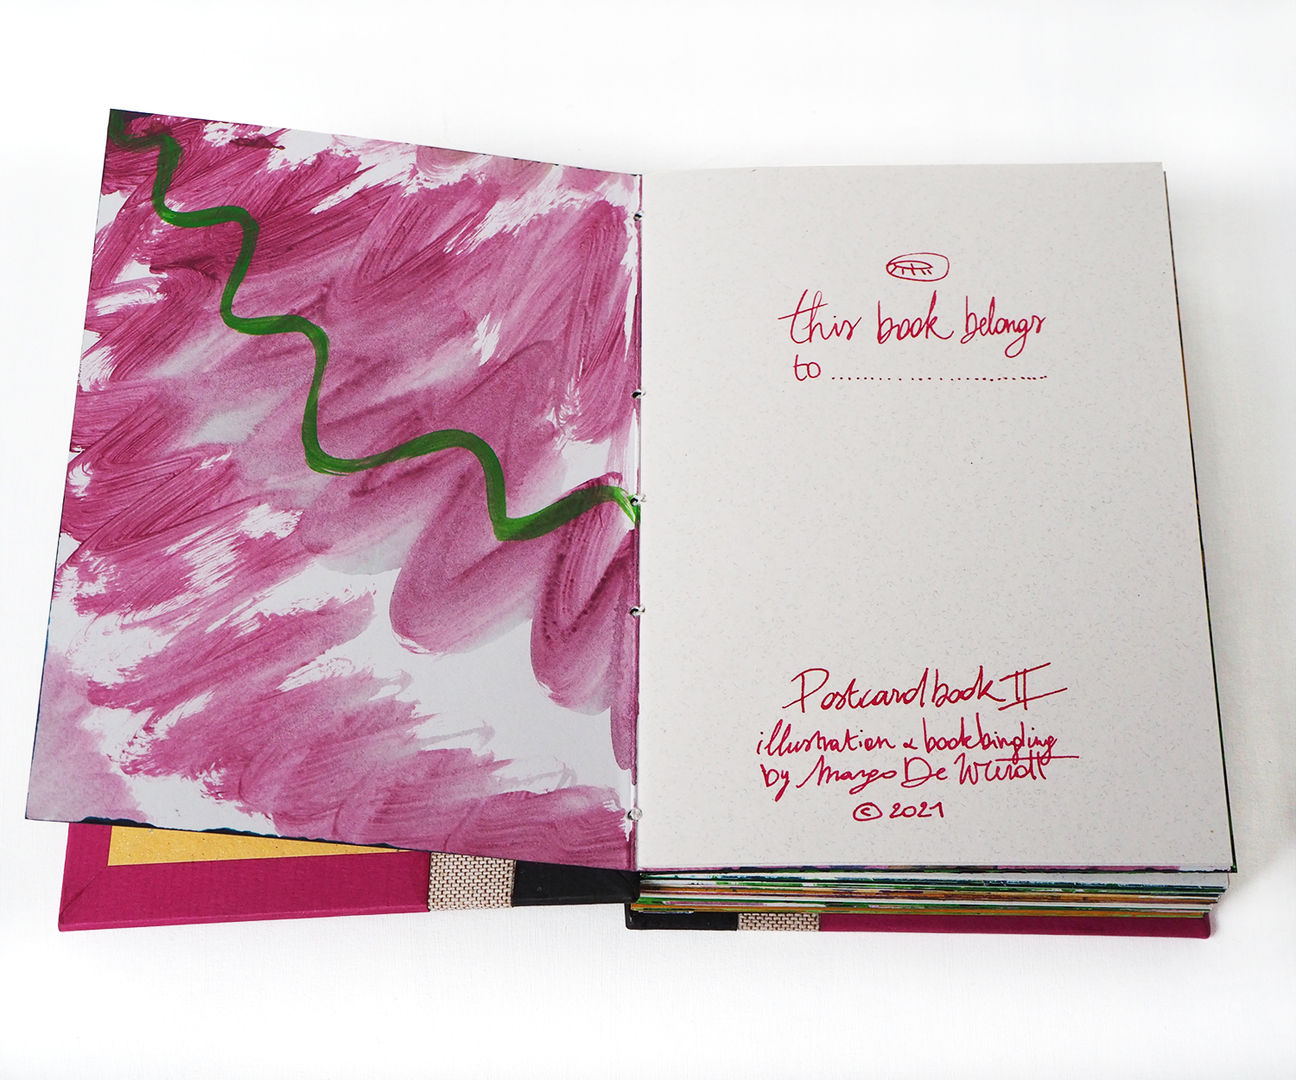 Postcardbook II